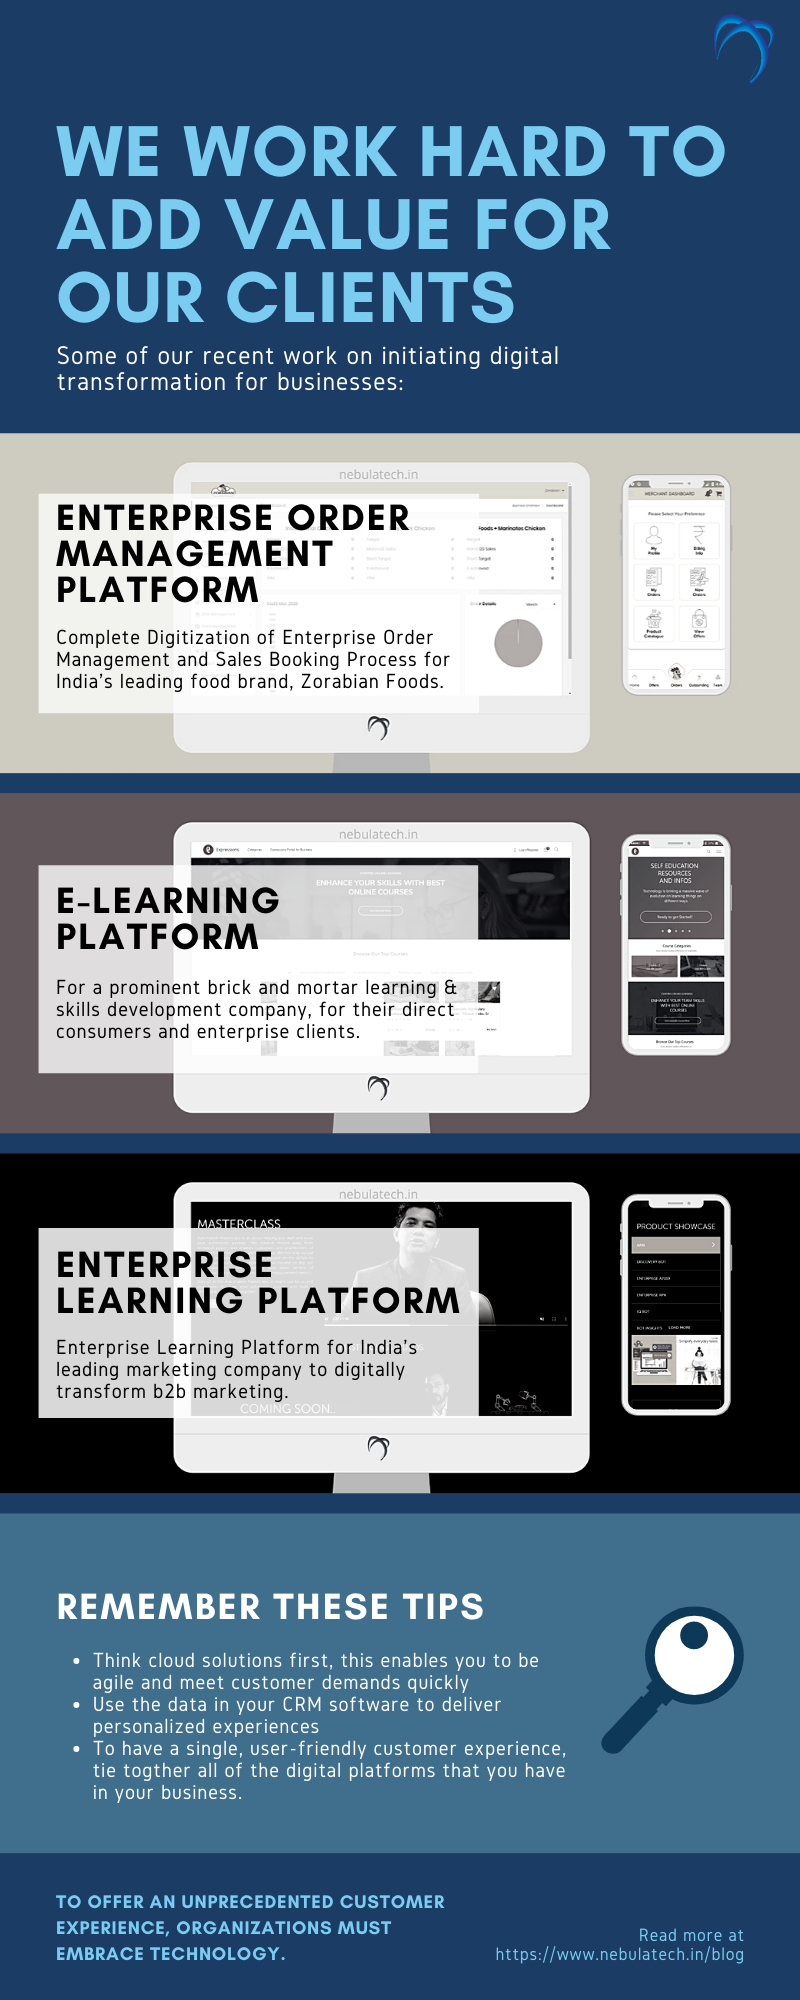 digital technology digital india mobile app marketing online learning solutions